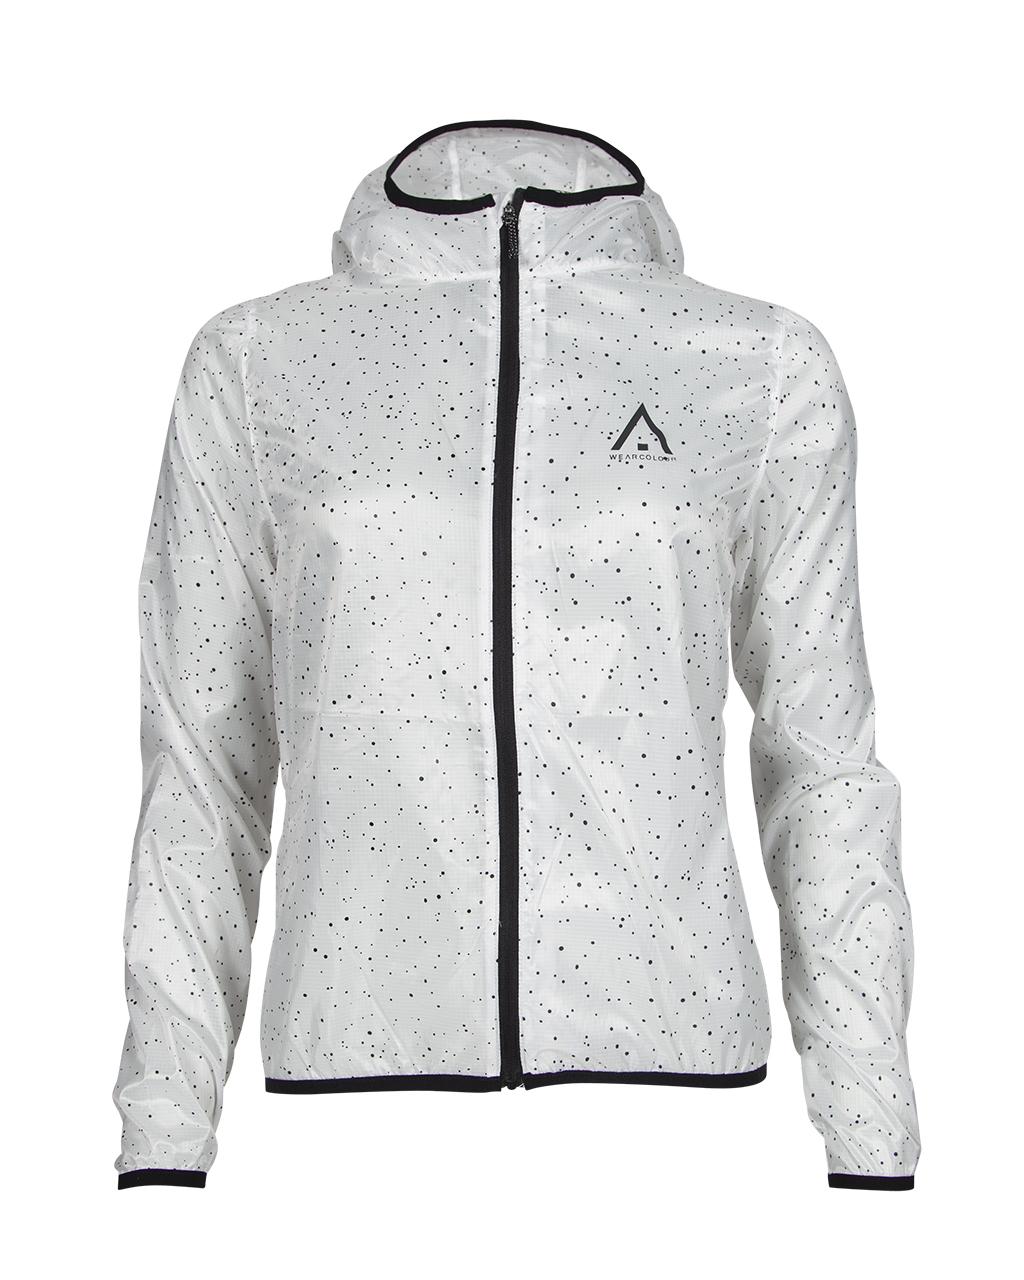 Arc Shorts in Black - Black CLWR Colour Wear tviHv2huSQ